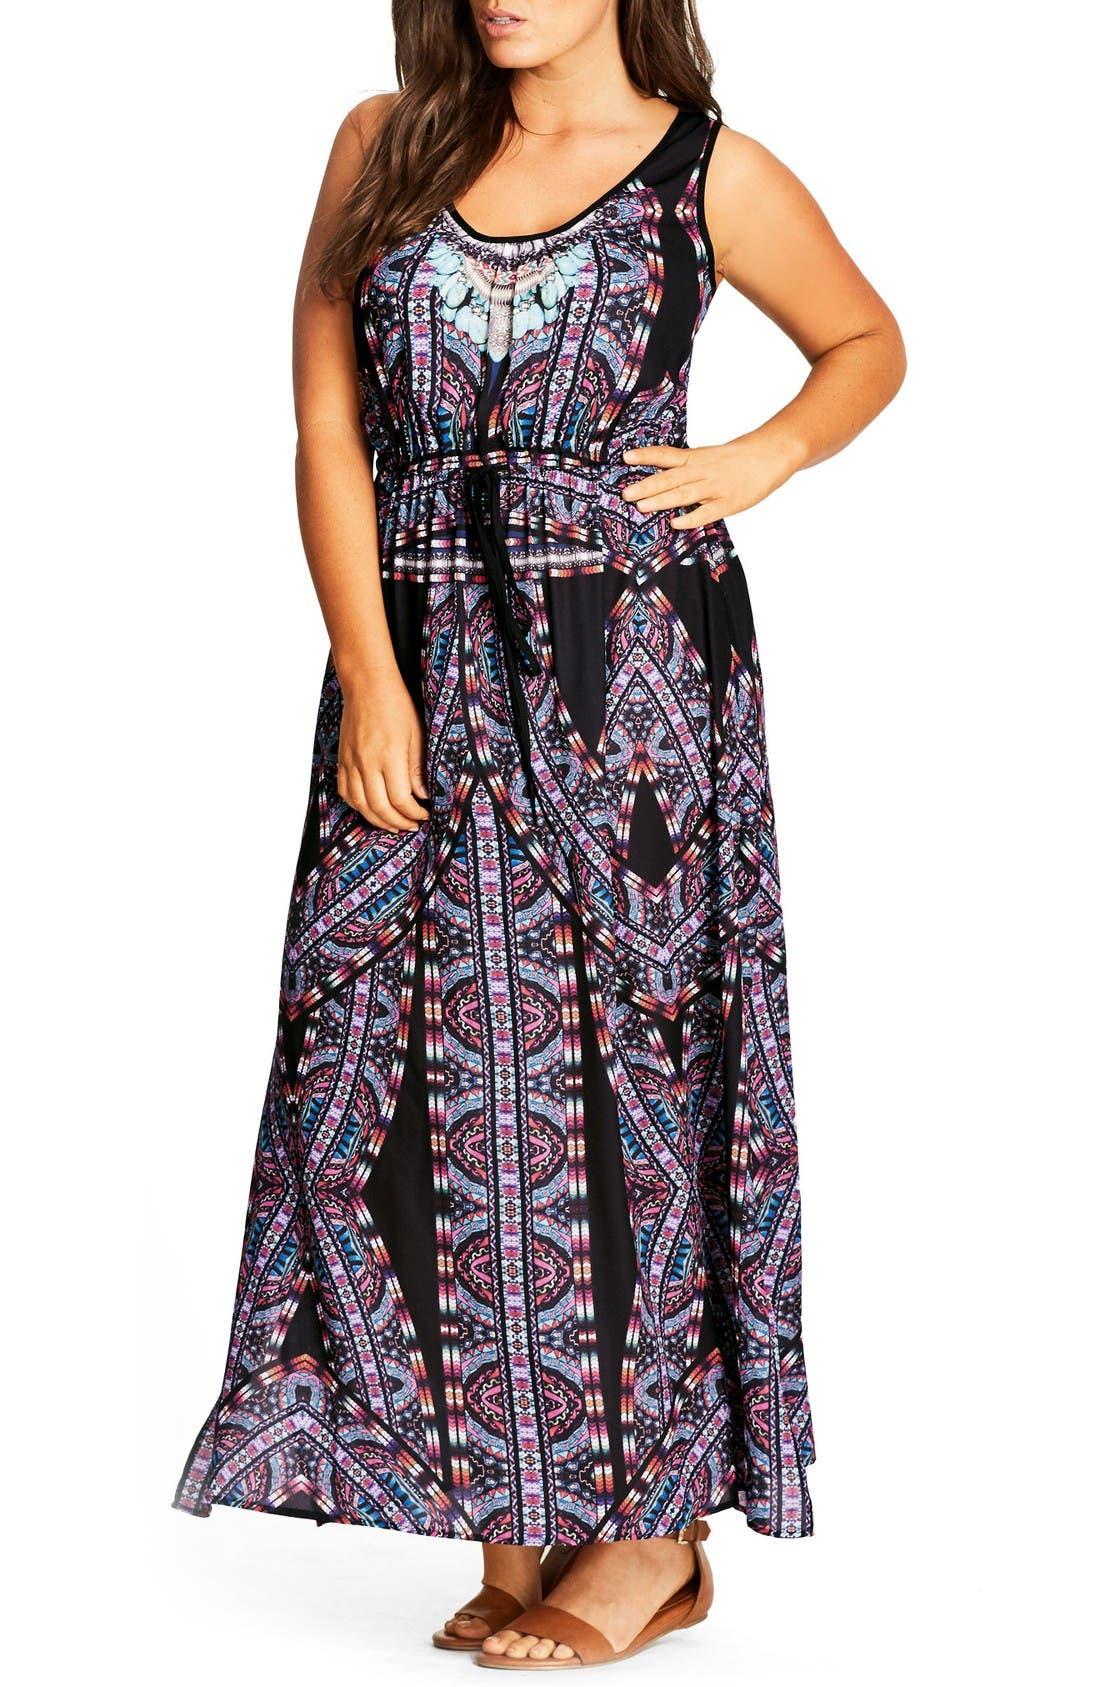 'Biba' Drawstring Maxi Dress,                         Main,                         color, Black